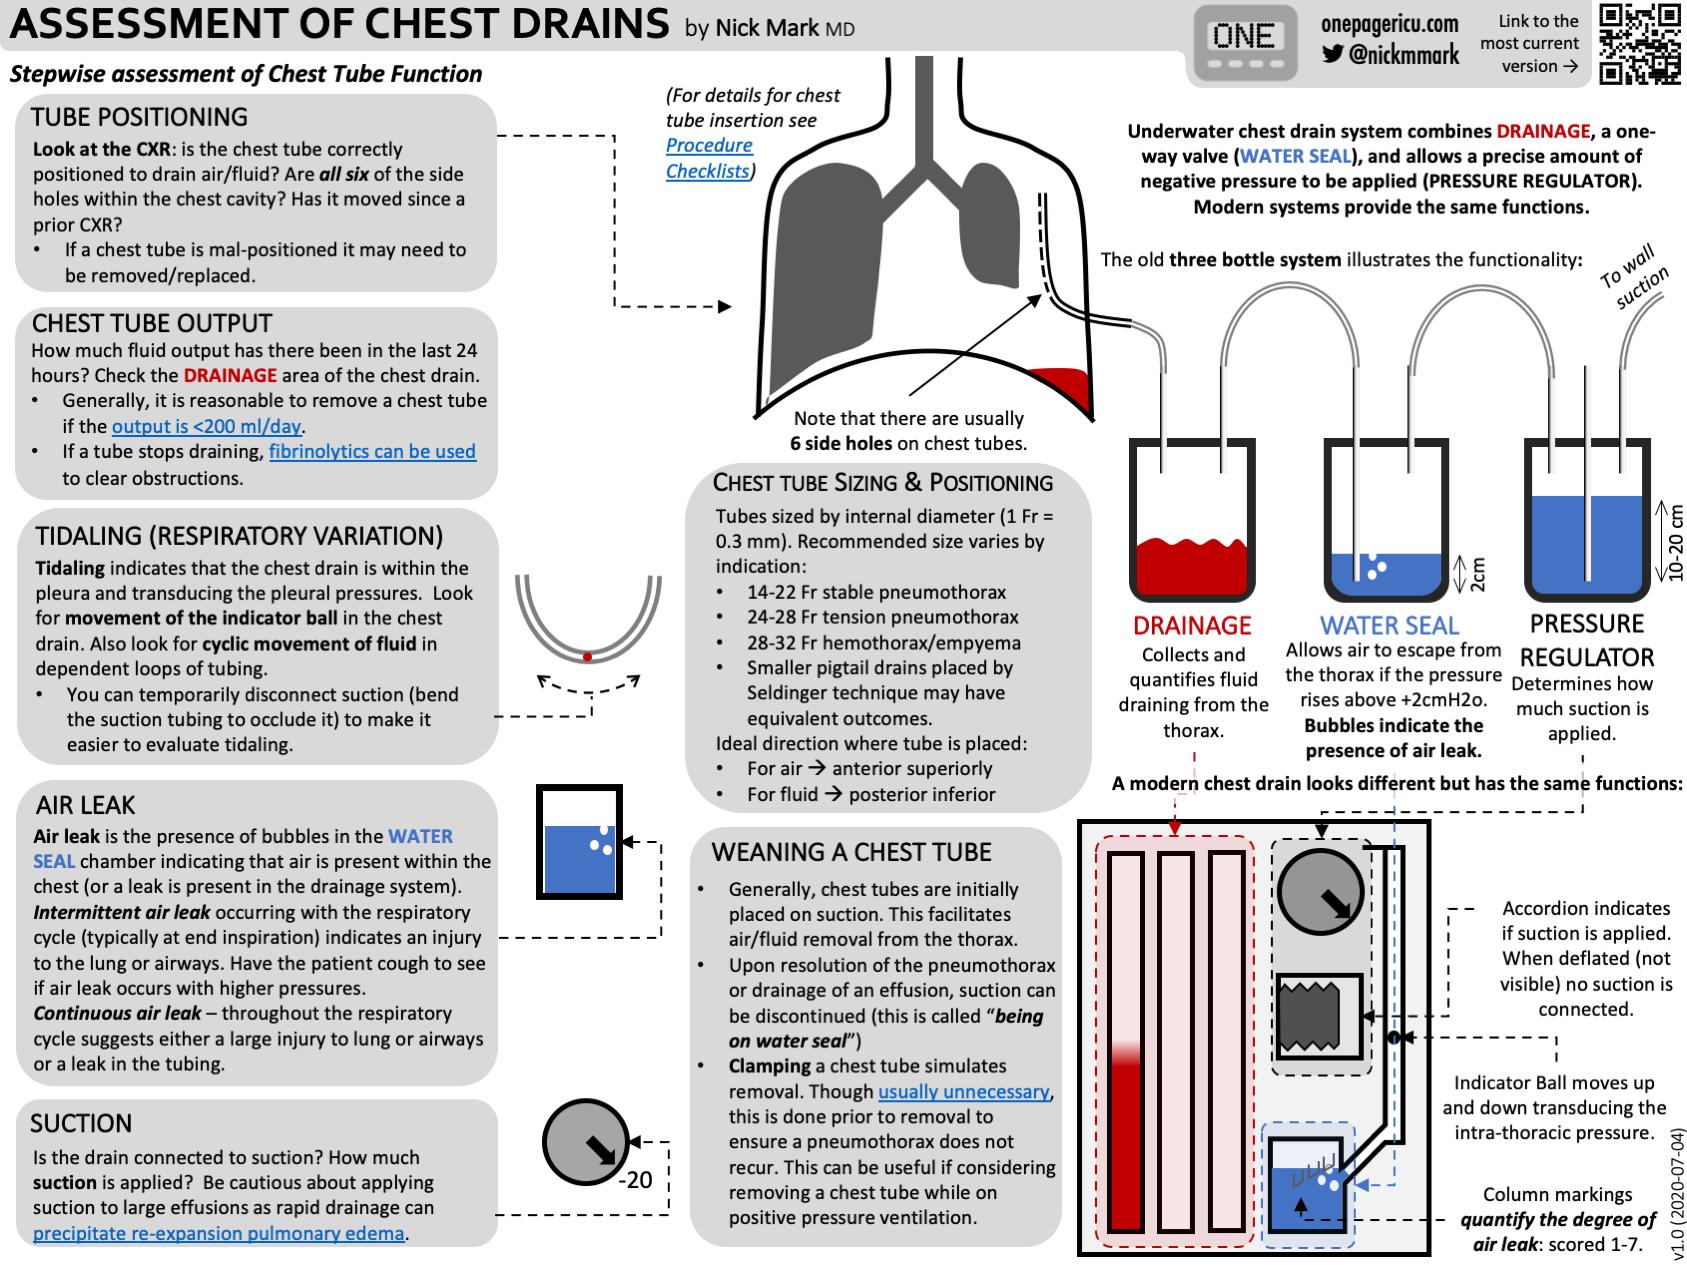 Chest drains